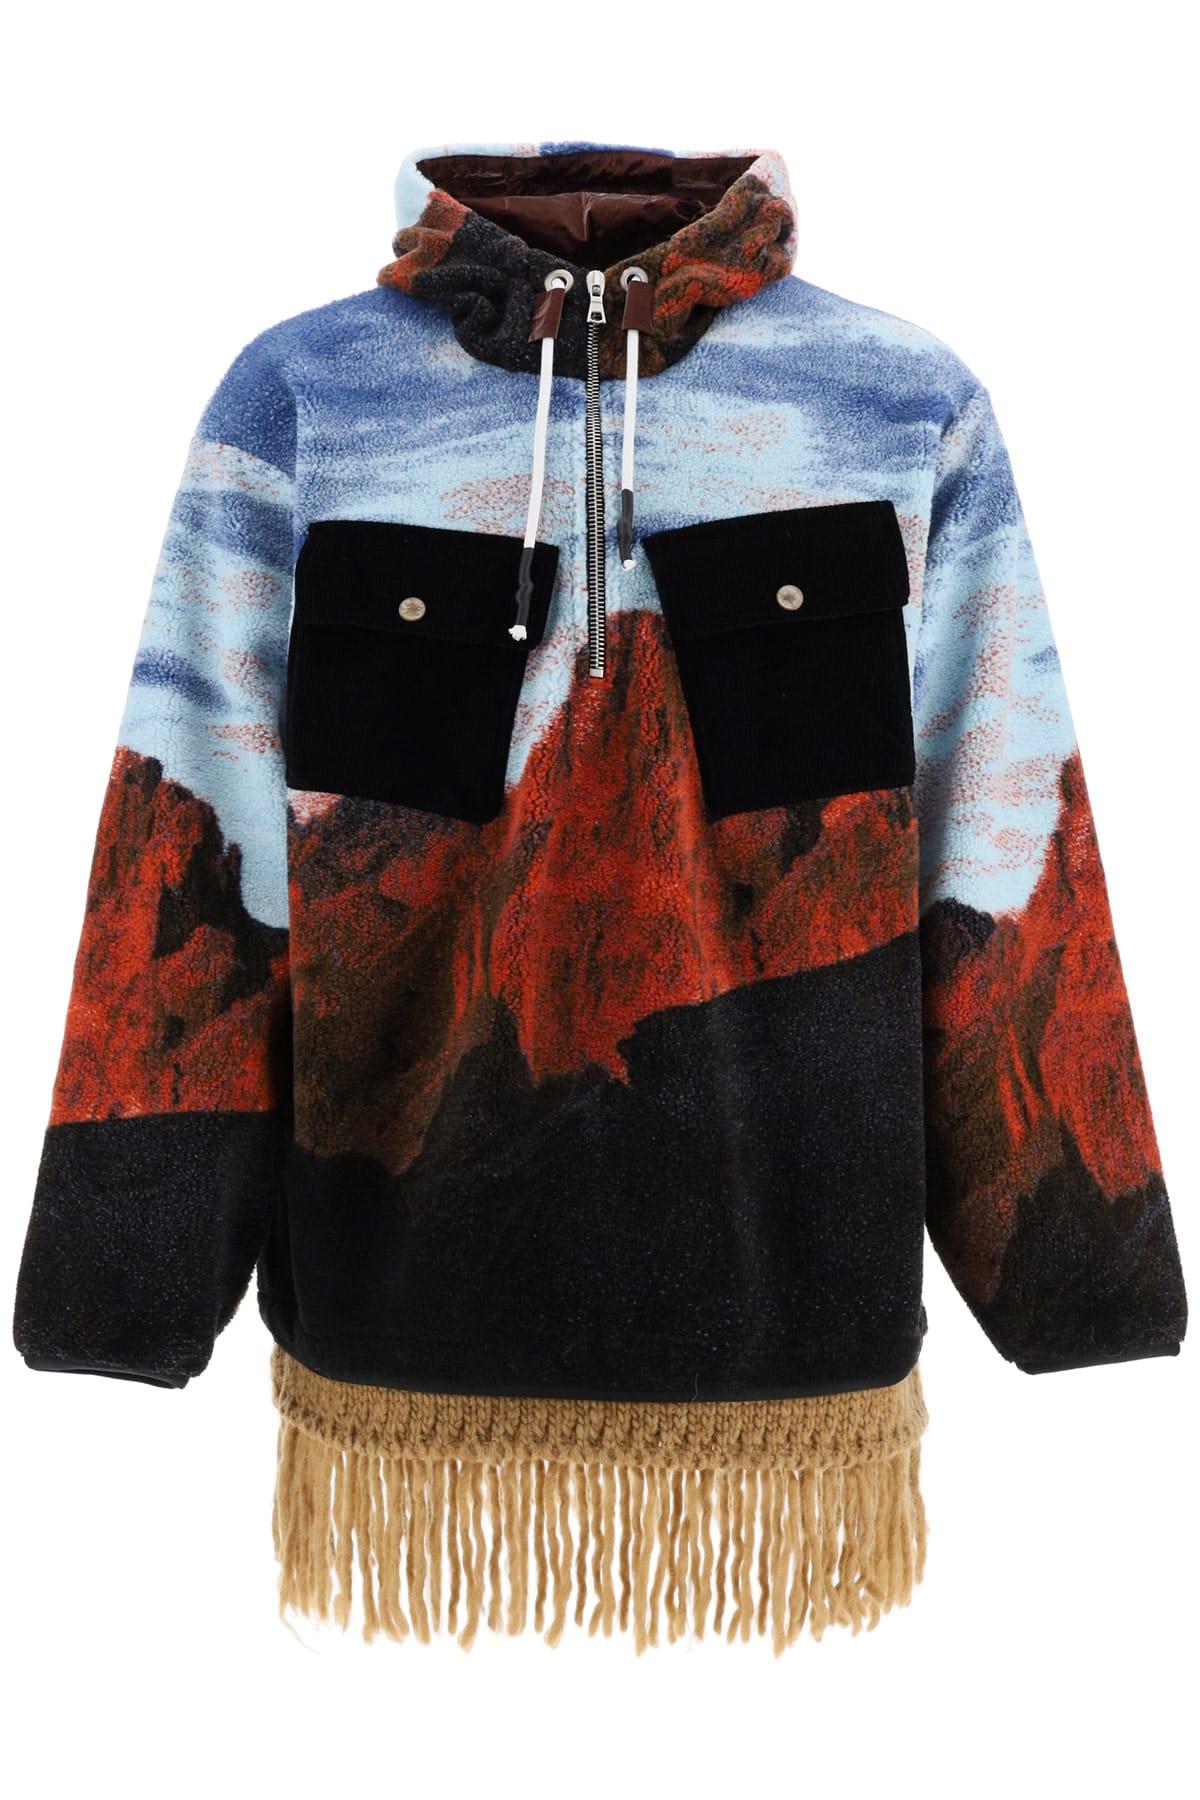 Palm Angels Canyon Fleece Jacket